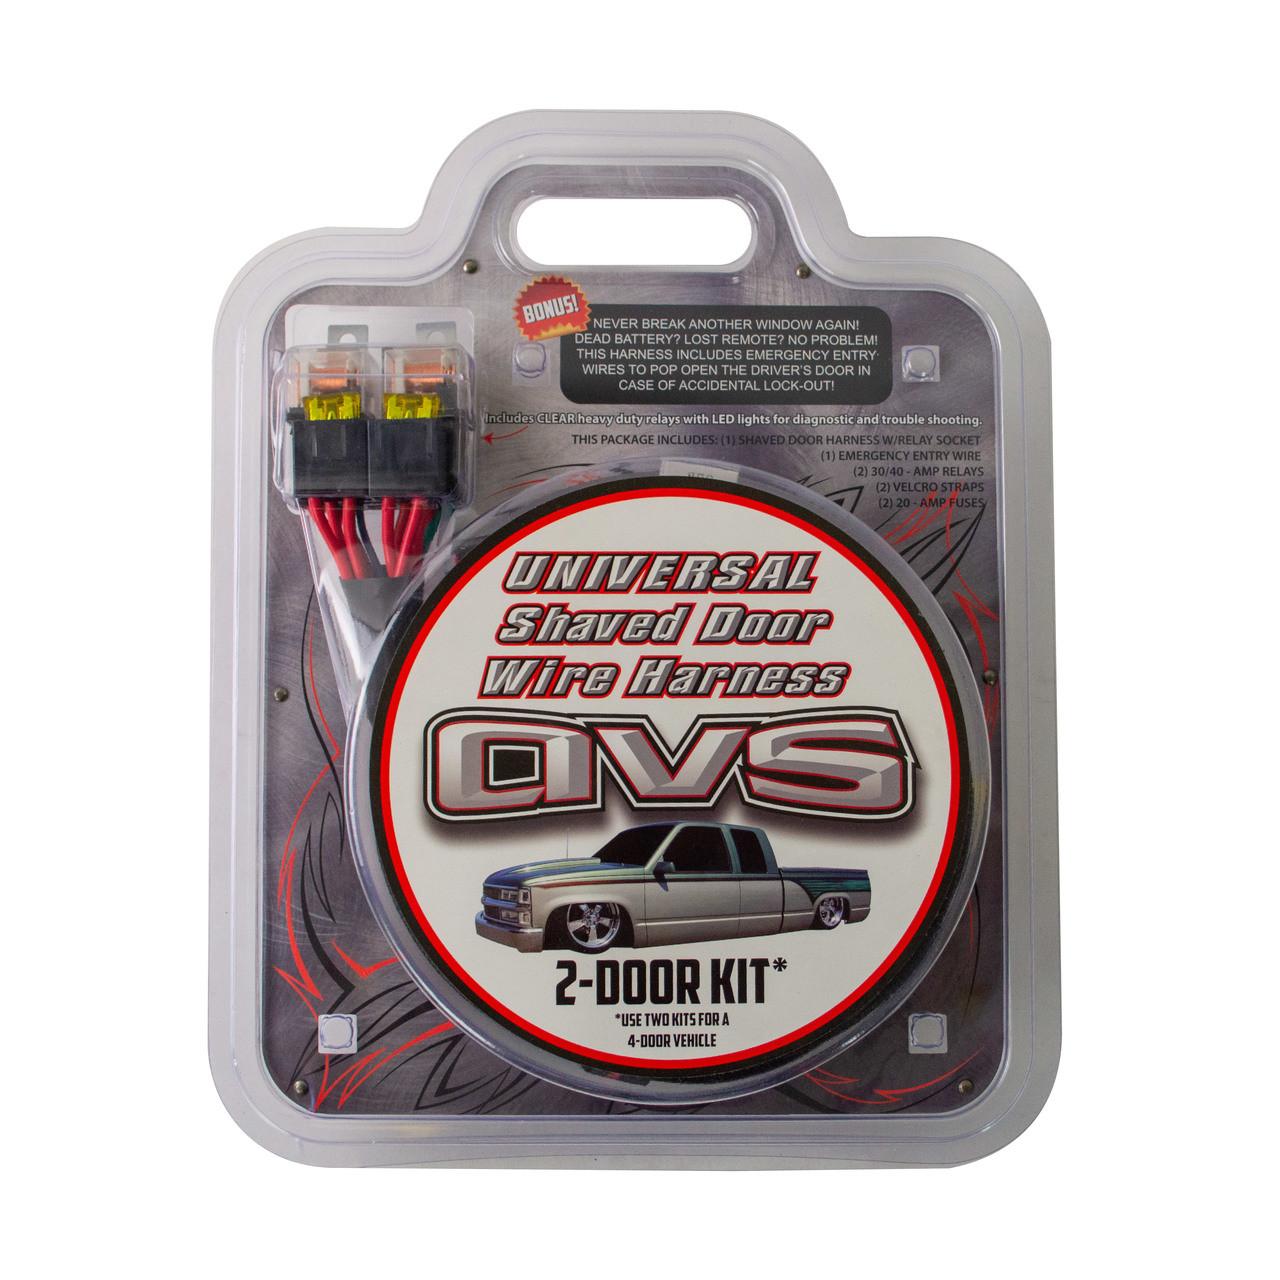 Avs Shaved Door Relay Wiring Harness Plug N Play Avs